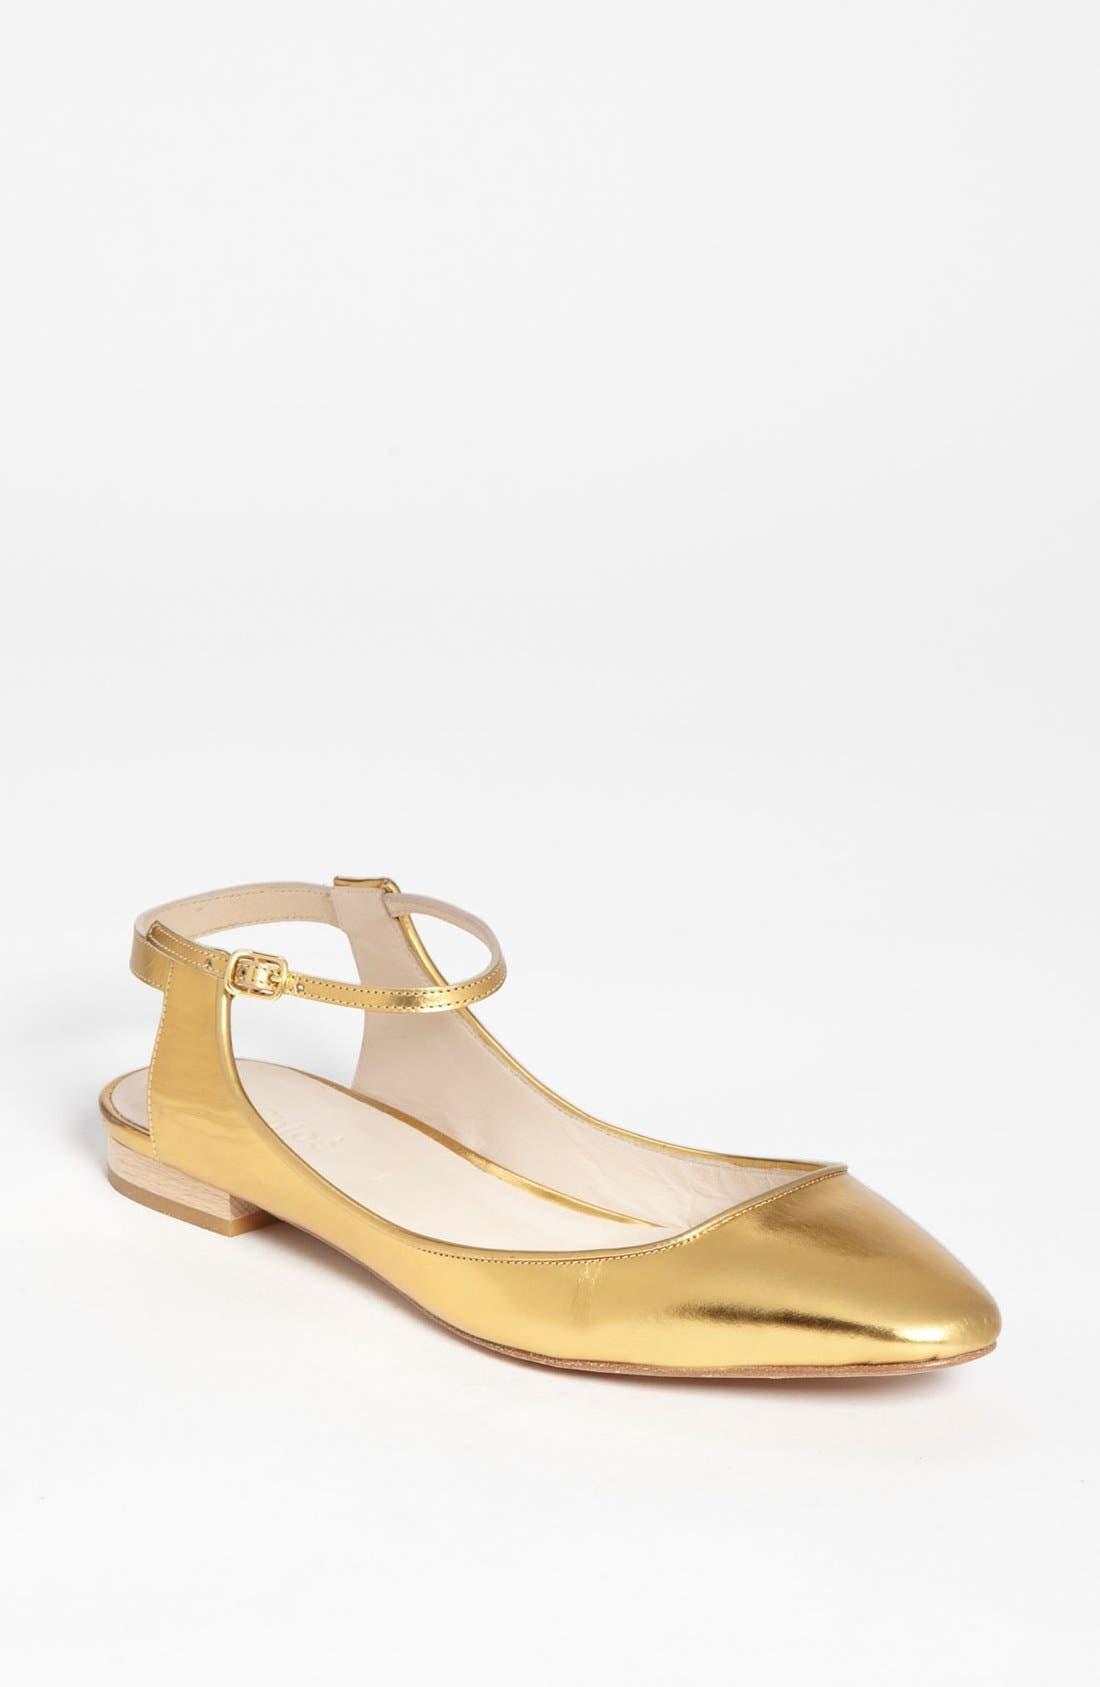 Main Image - Chloé Ankle Strap Flat